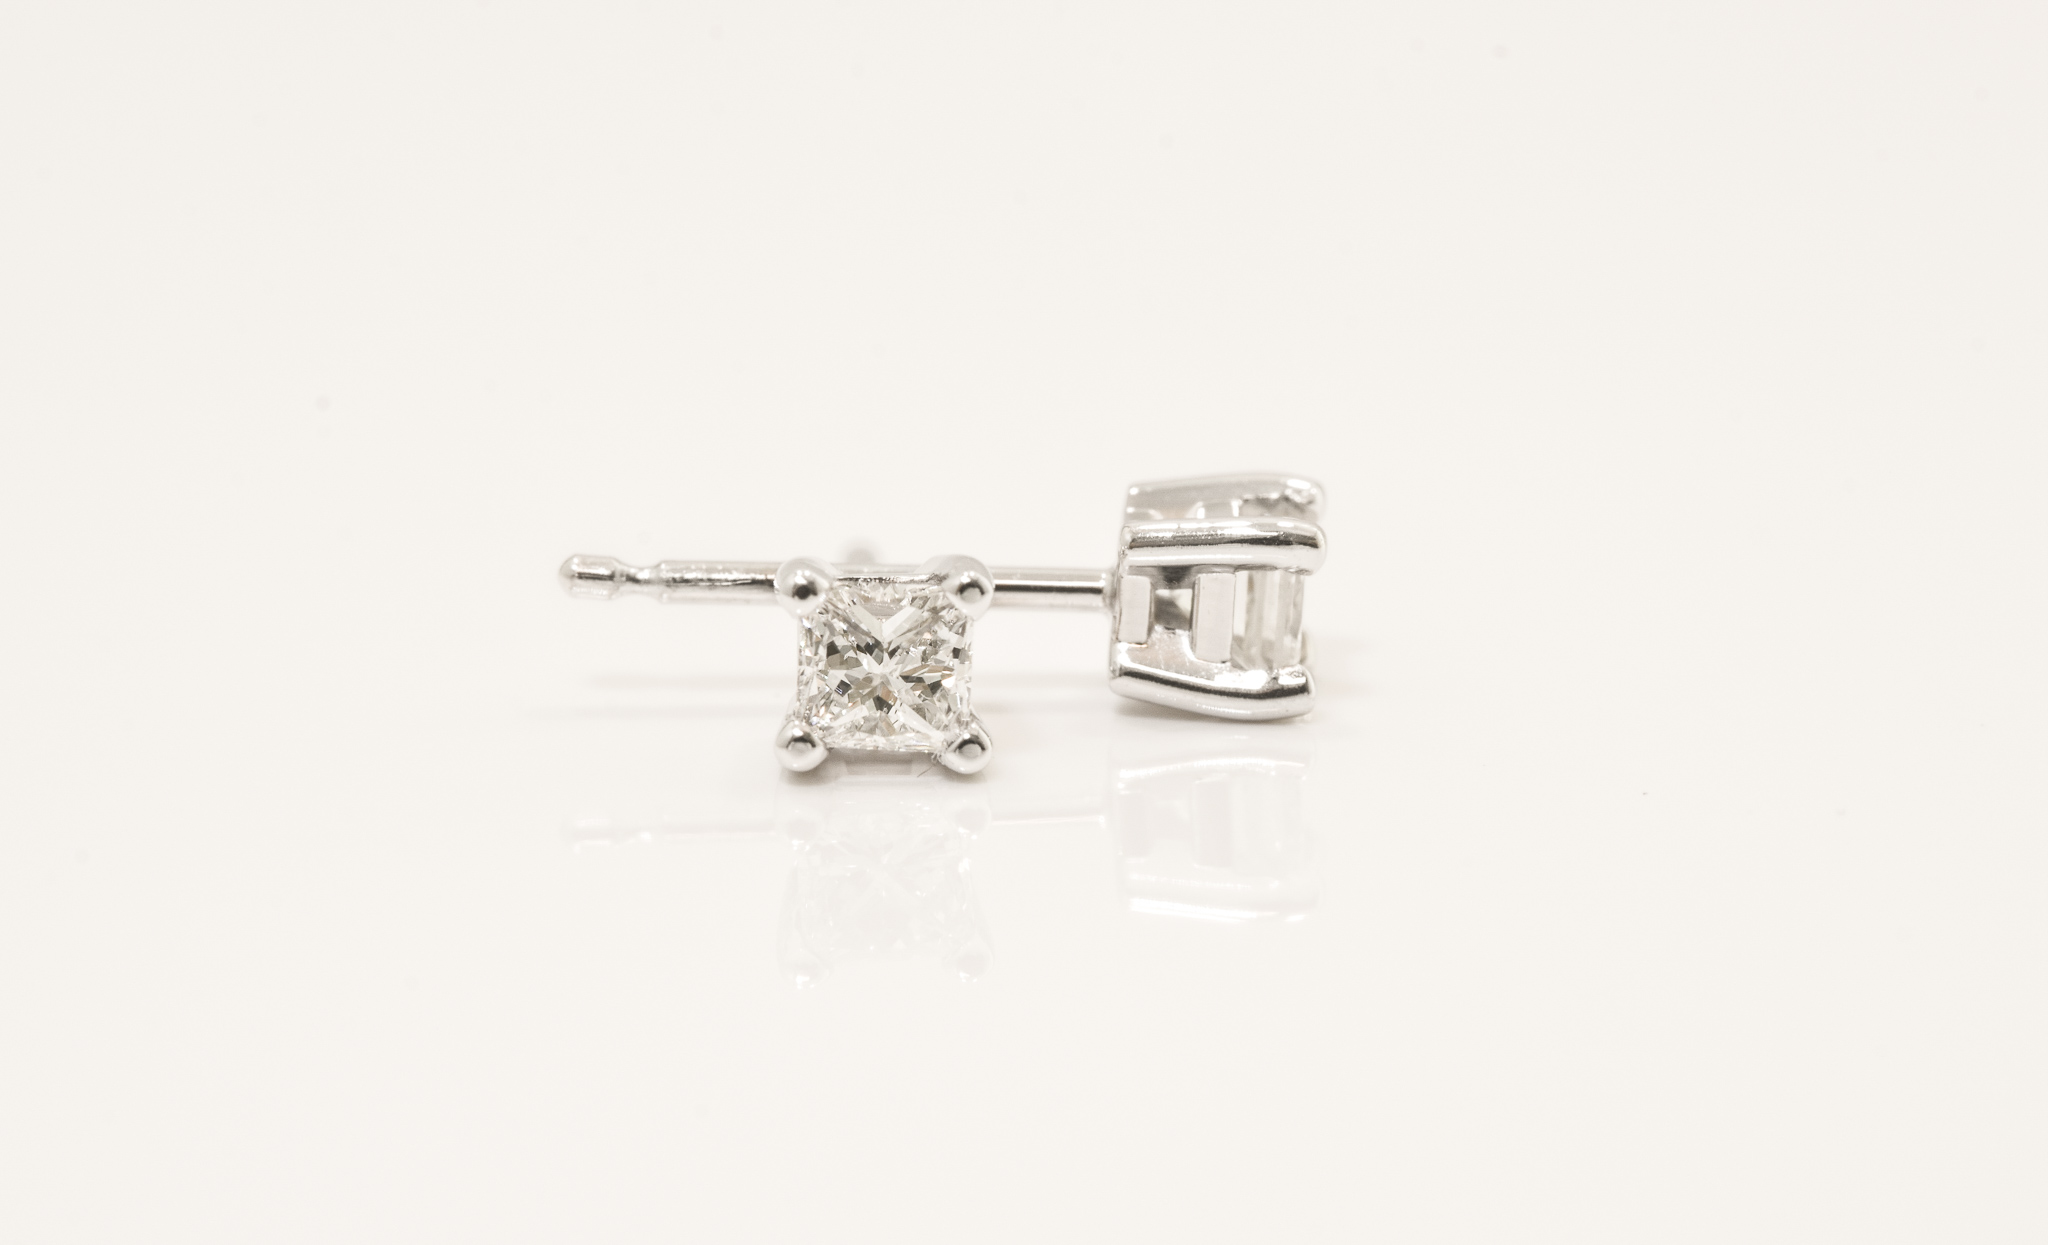 14 kt. White Gold Diamond Stud Earring.  .29ct tdwt. Princess Cut Diamonds. SI1, G-H